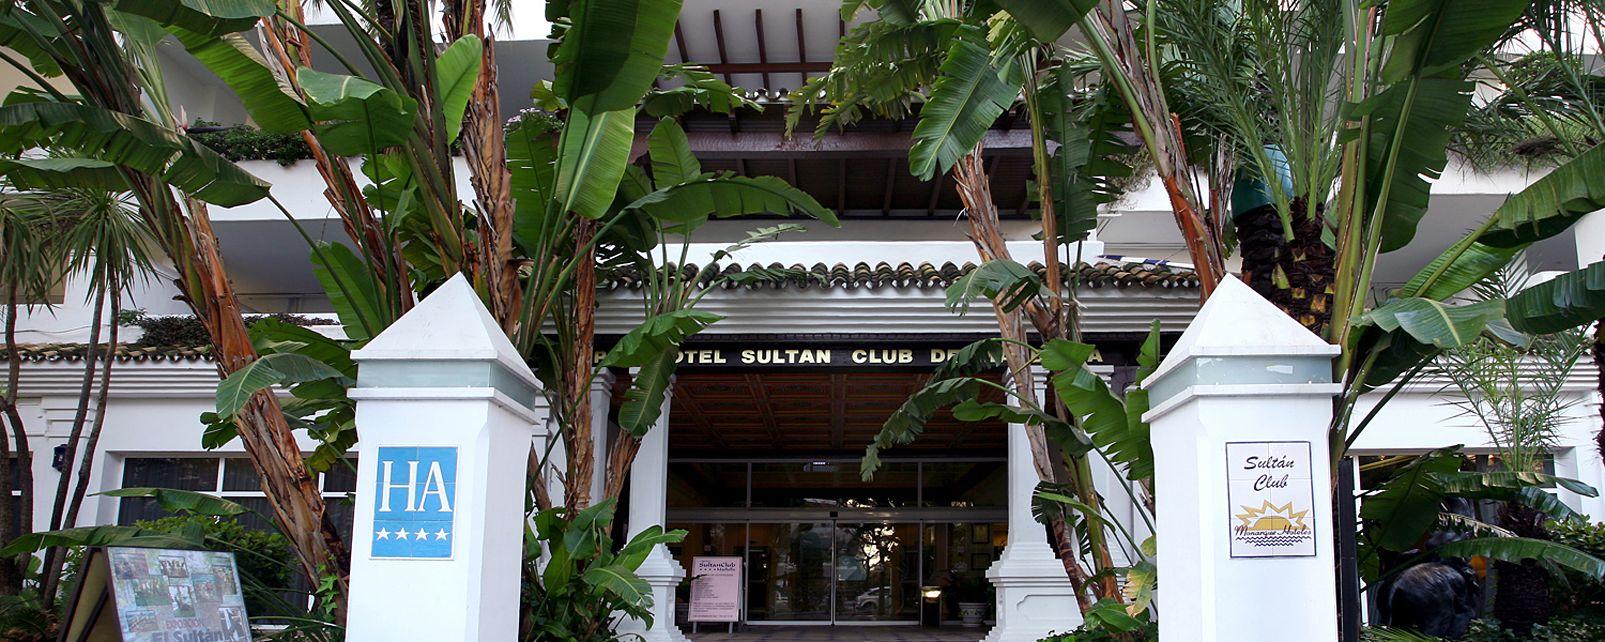 Hôtel Sultan